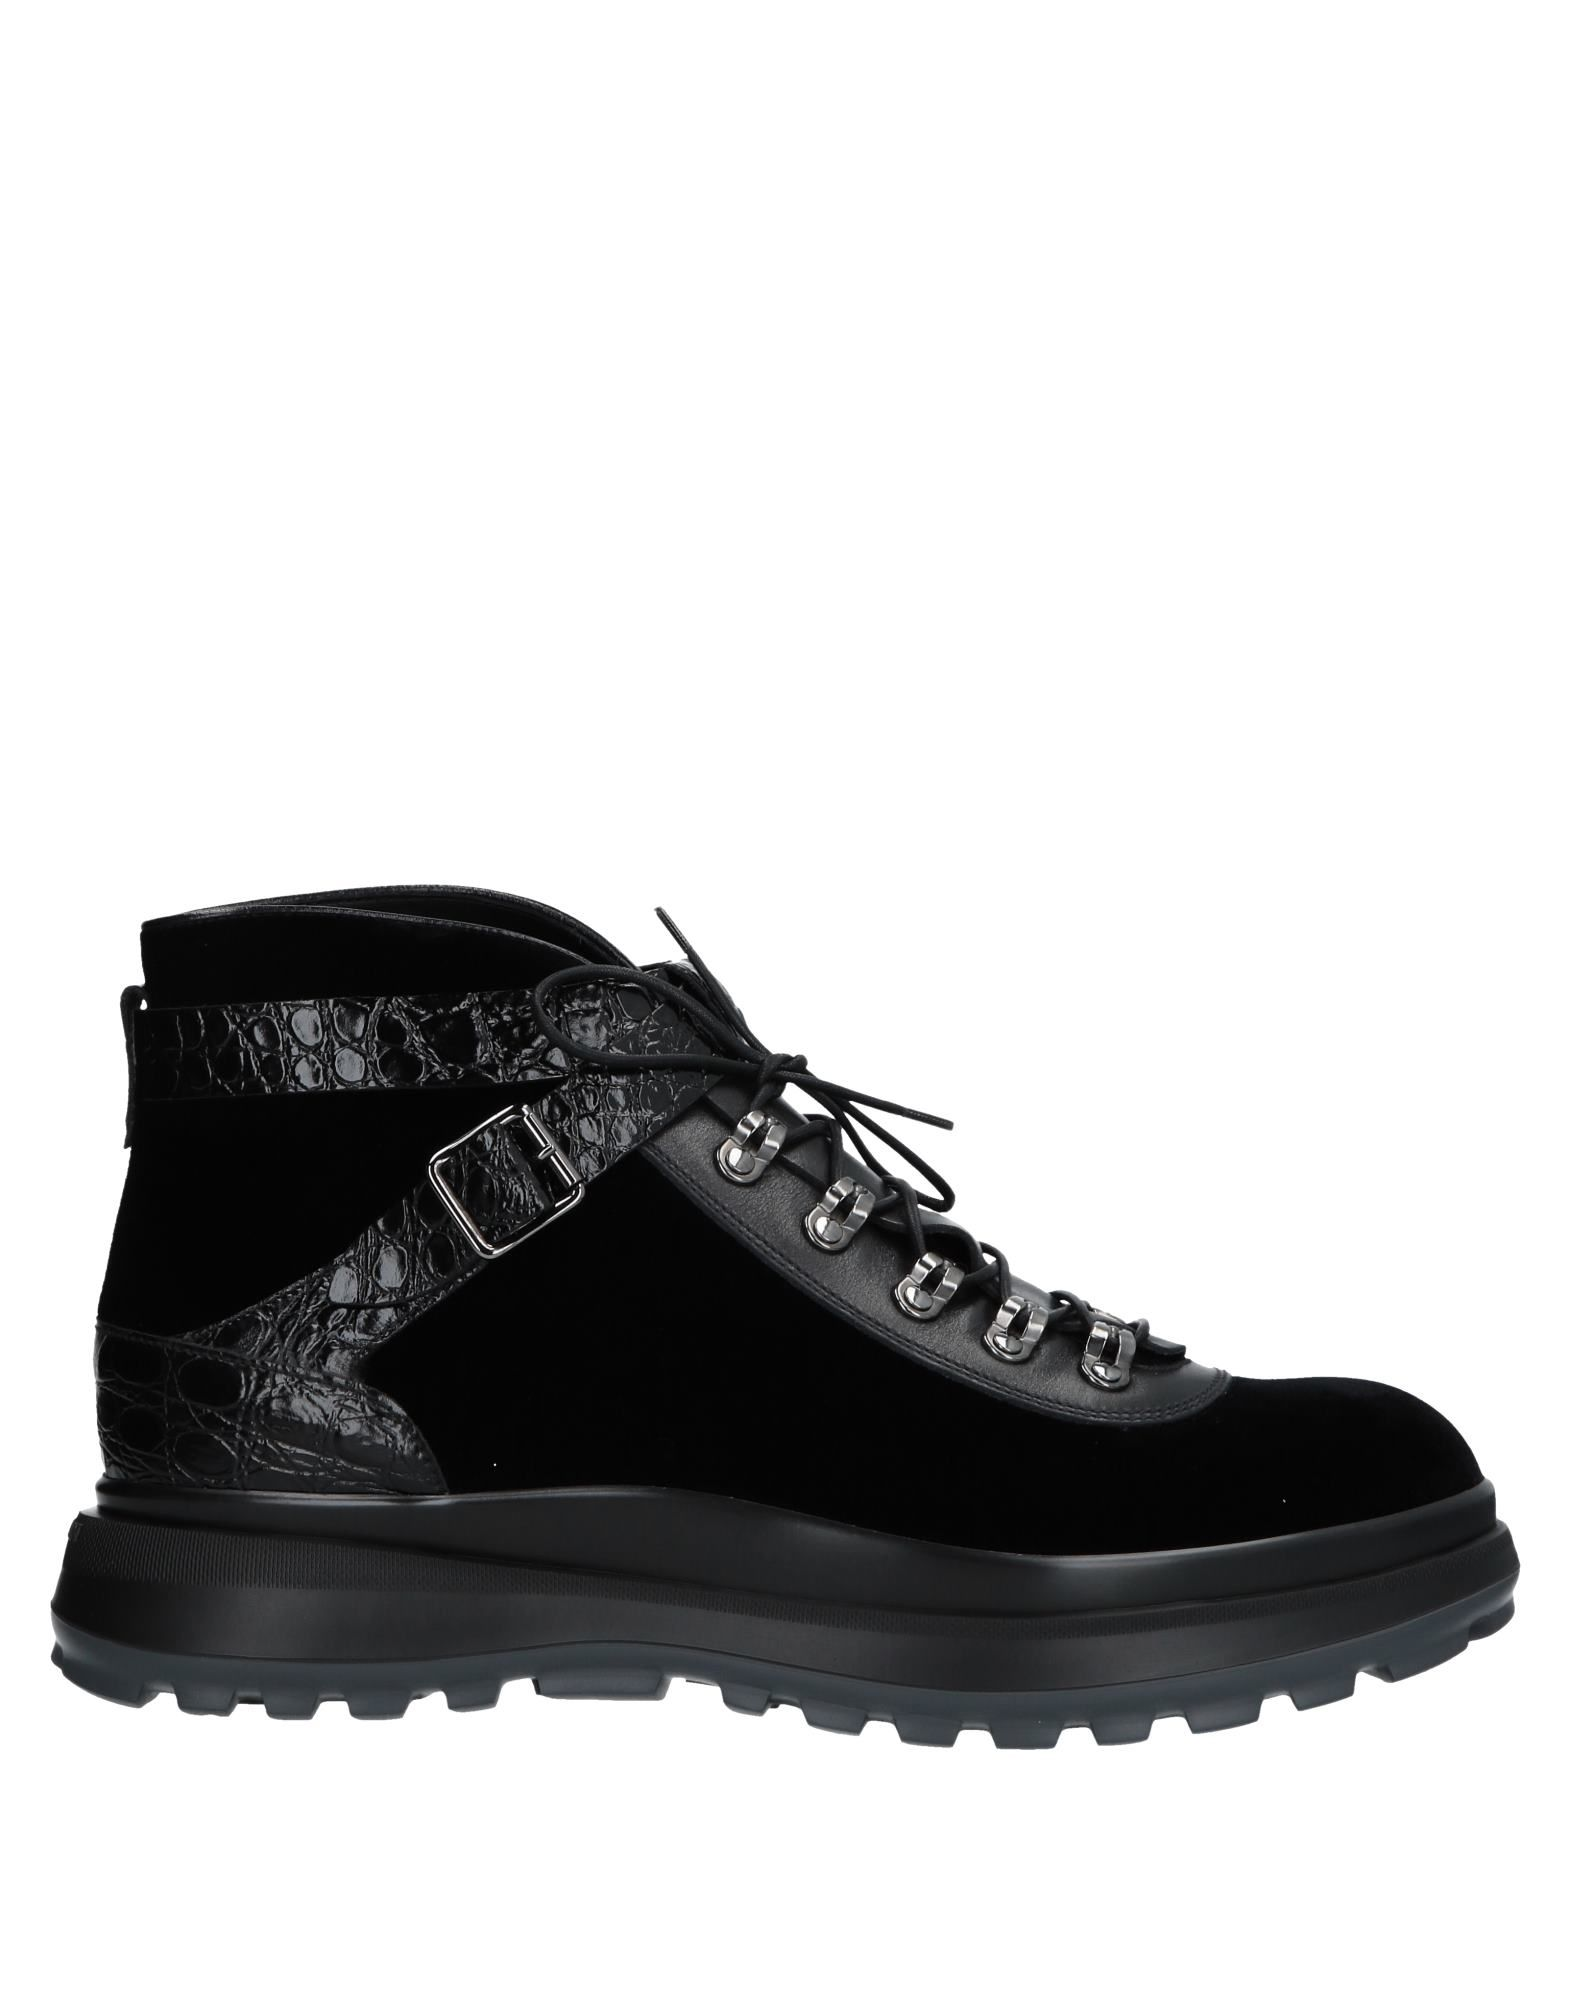 newest collection 33fd7 045a6 Sneakers Giorgio Armani Homme - Sneakers Giorgio Armani Noir Dédouanement  saisonnier